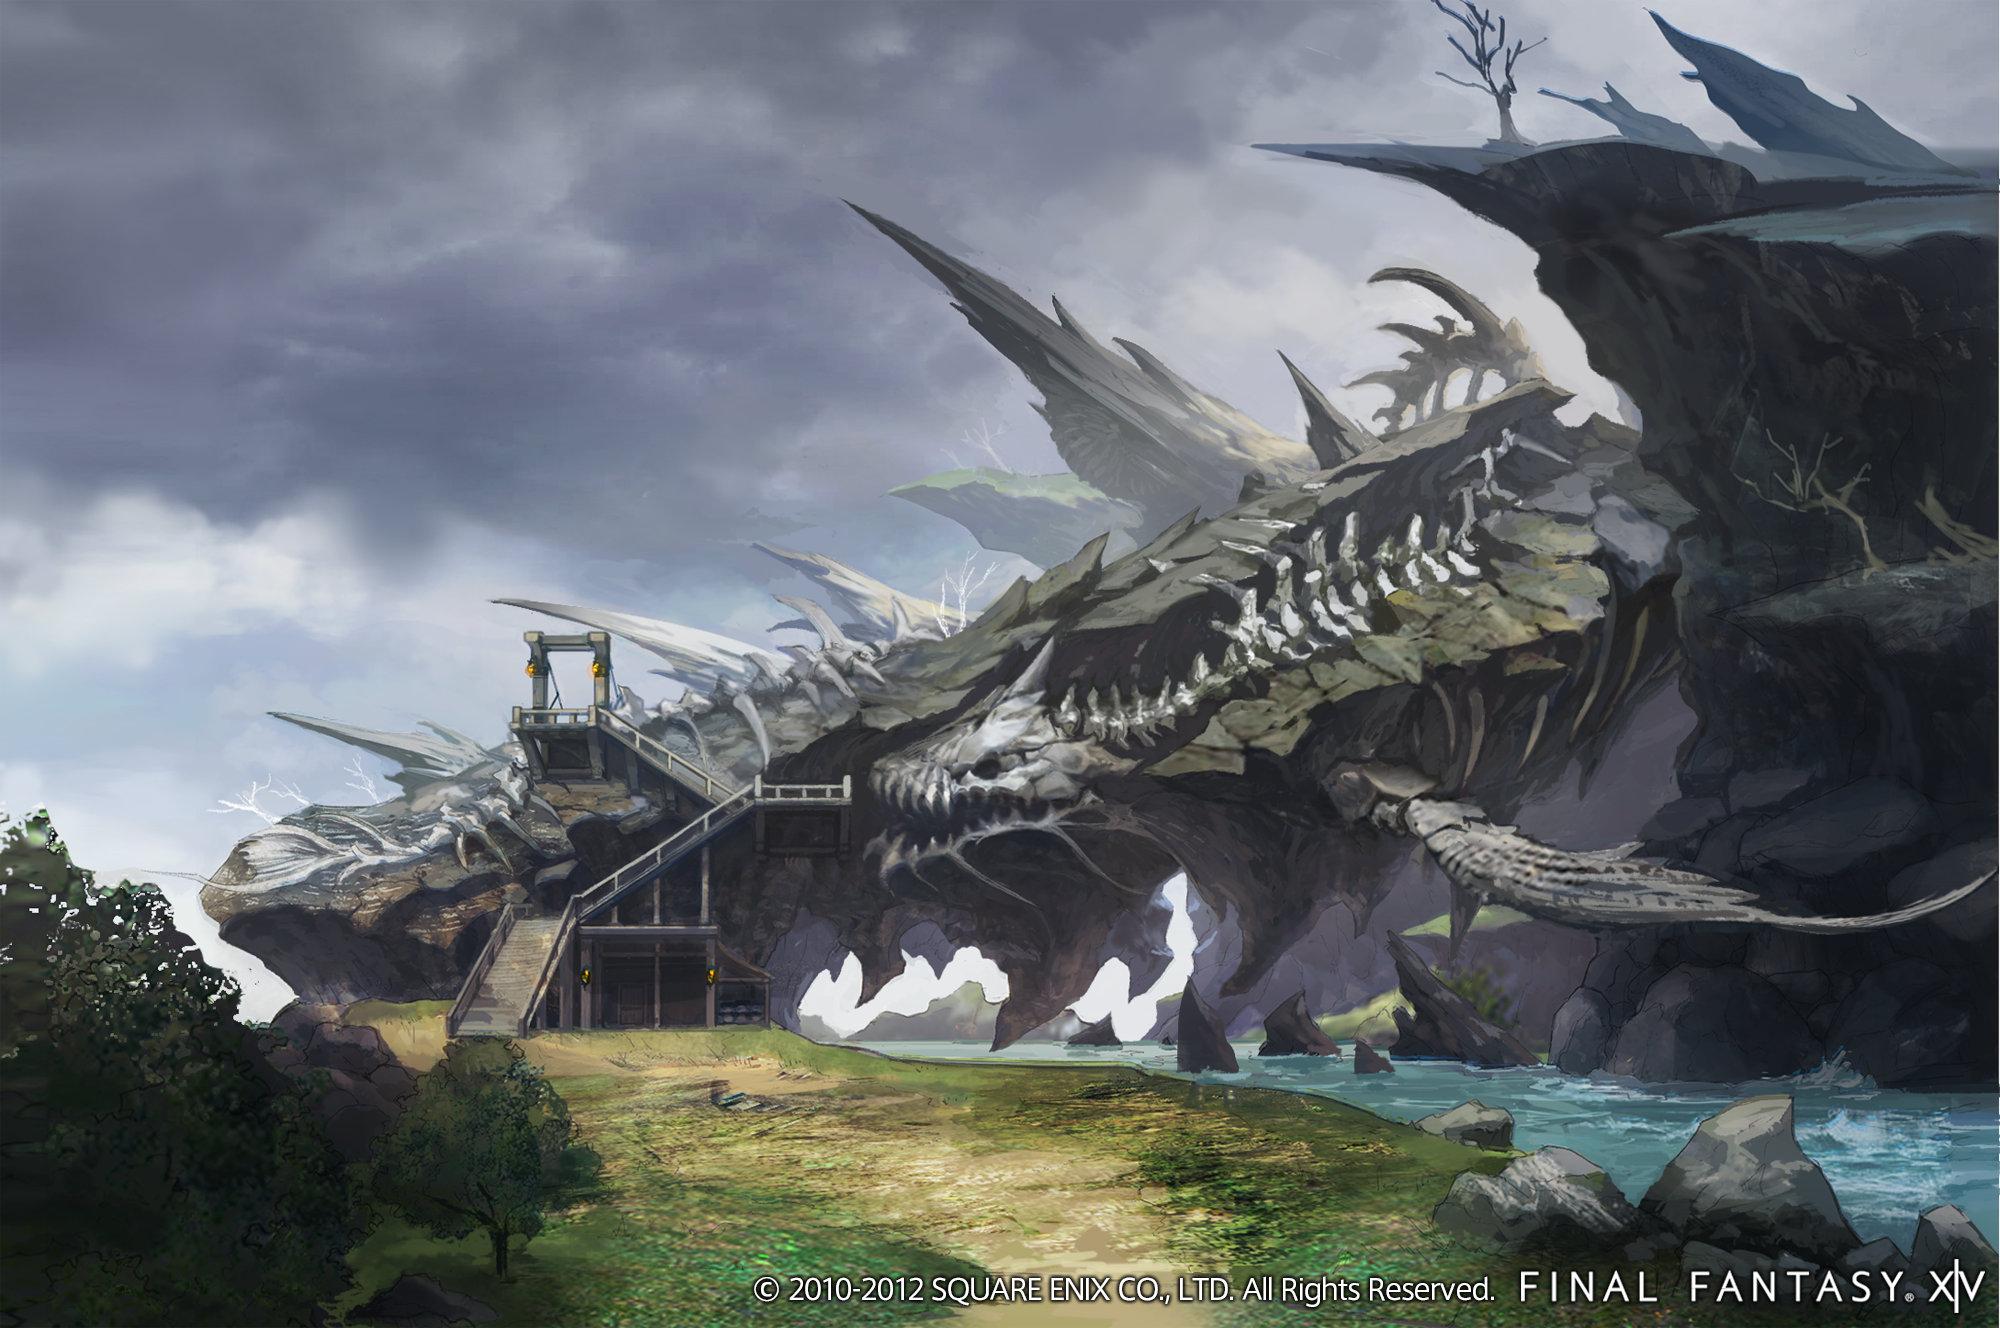 Fantasy XIV A Realm Reborn Computer Wallpapers Desktop Backgrounds 2000x1328